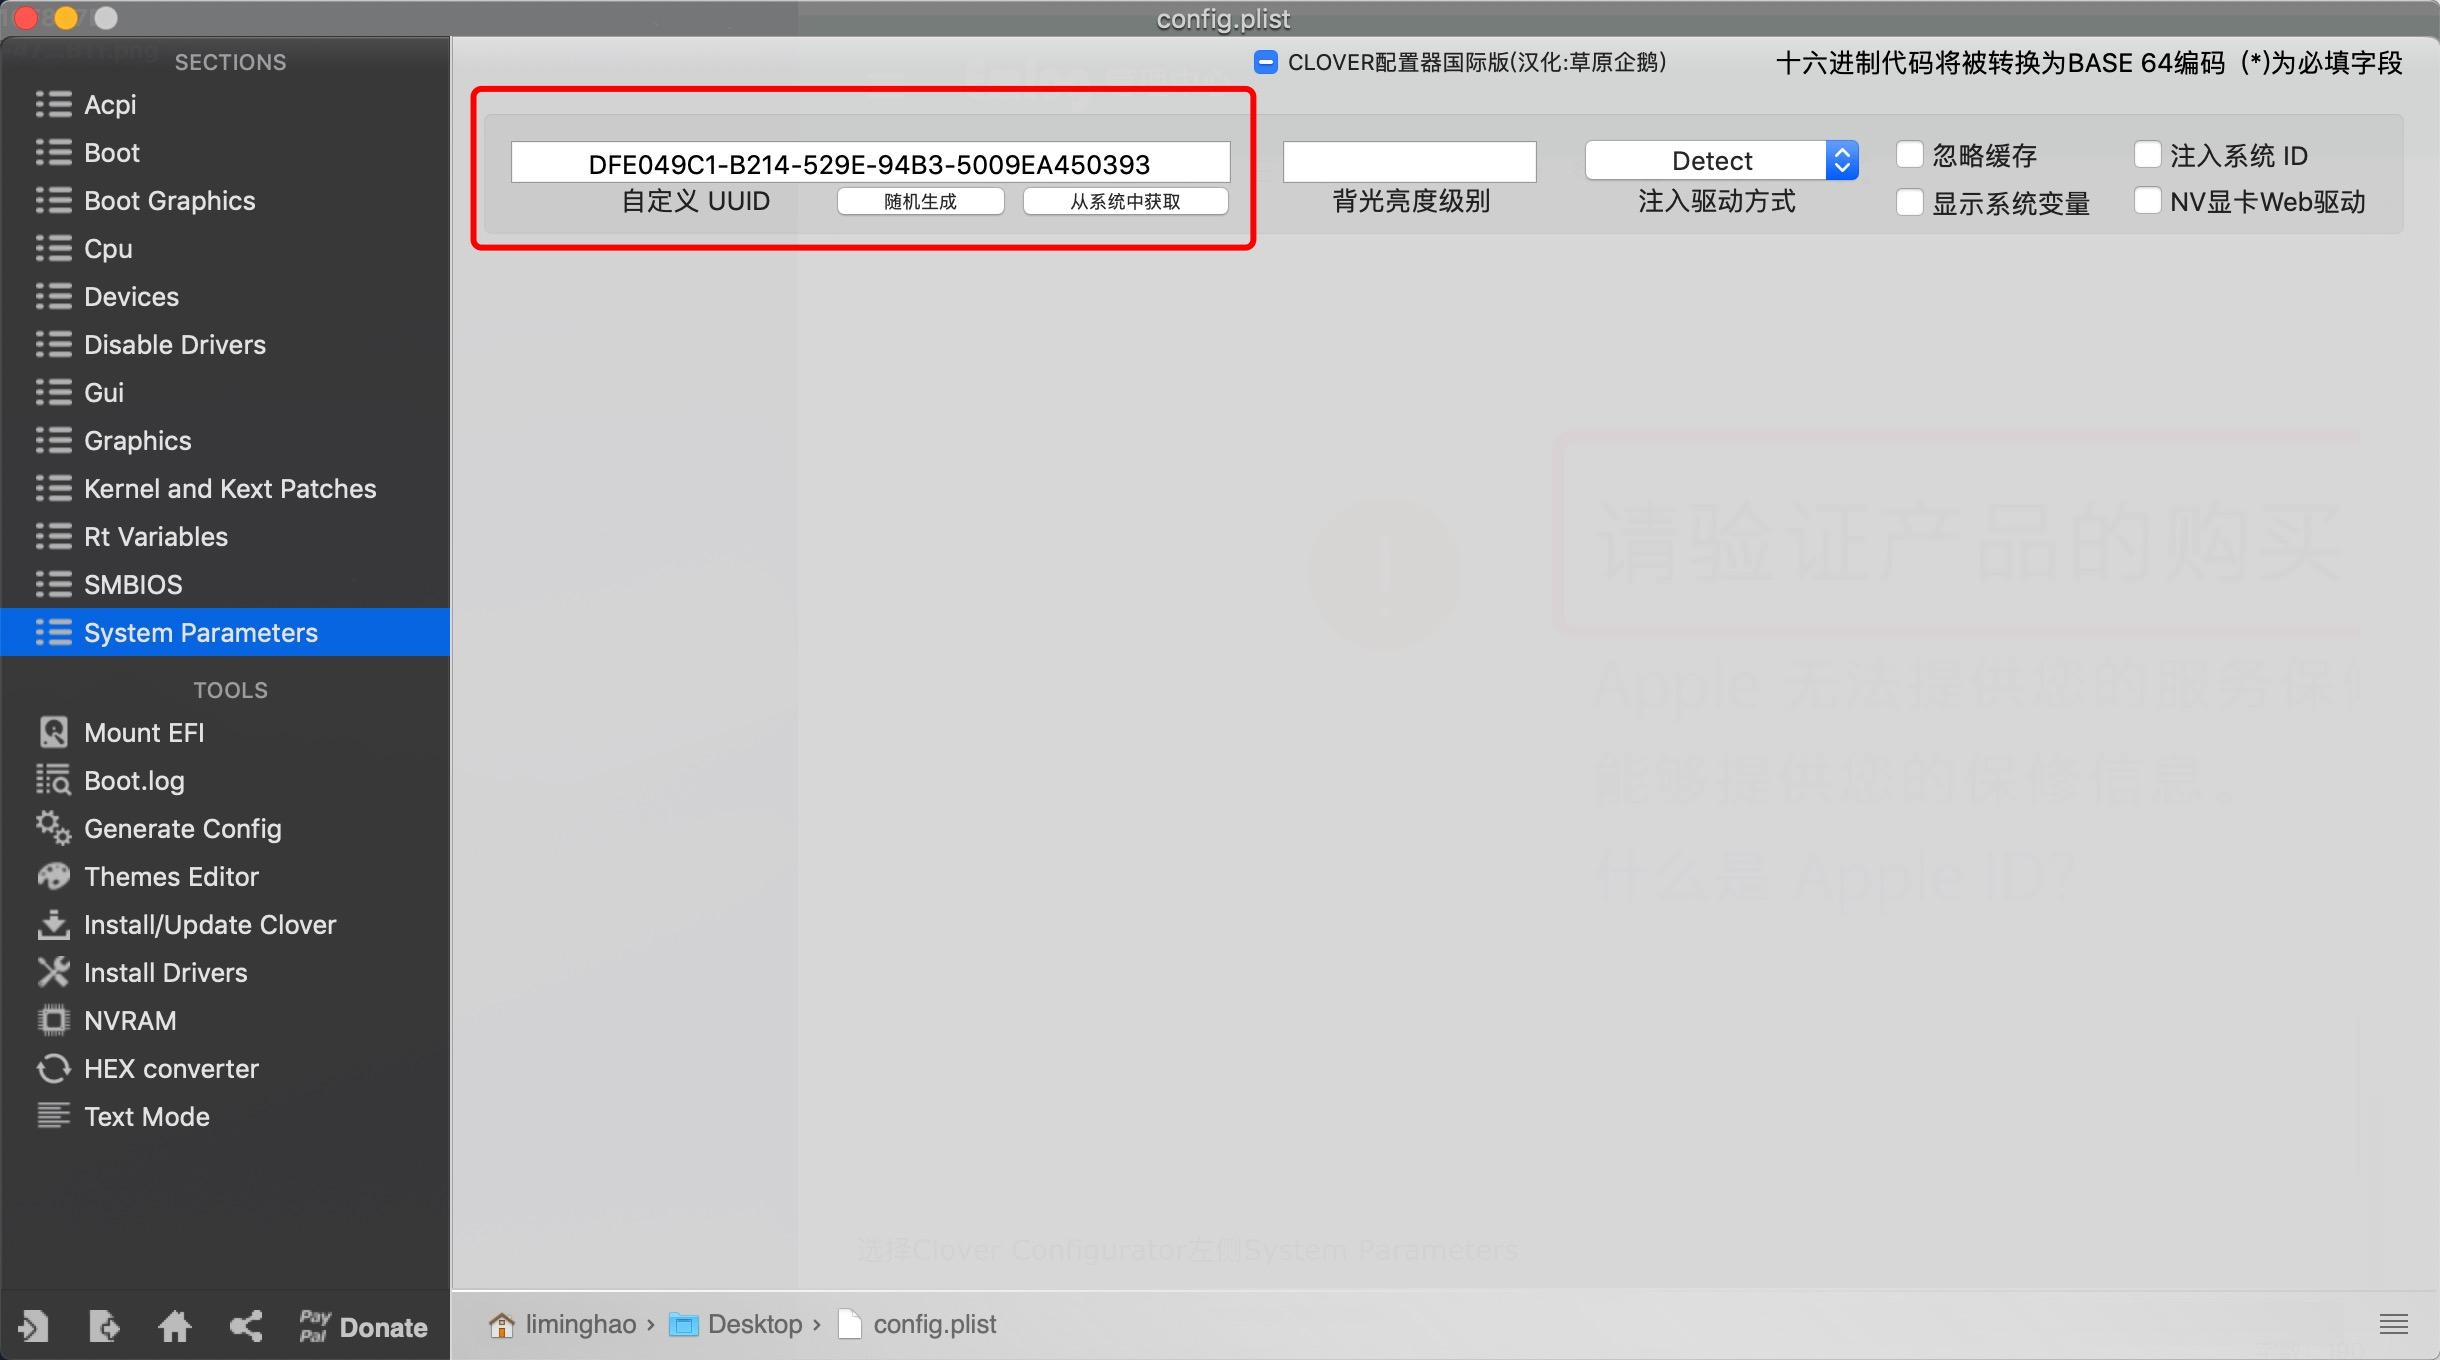 C9728521-0140-489B-BC52-E7165FC2214E.png